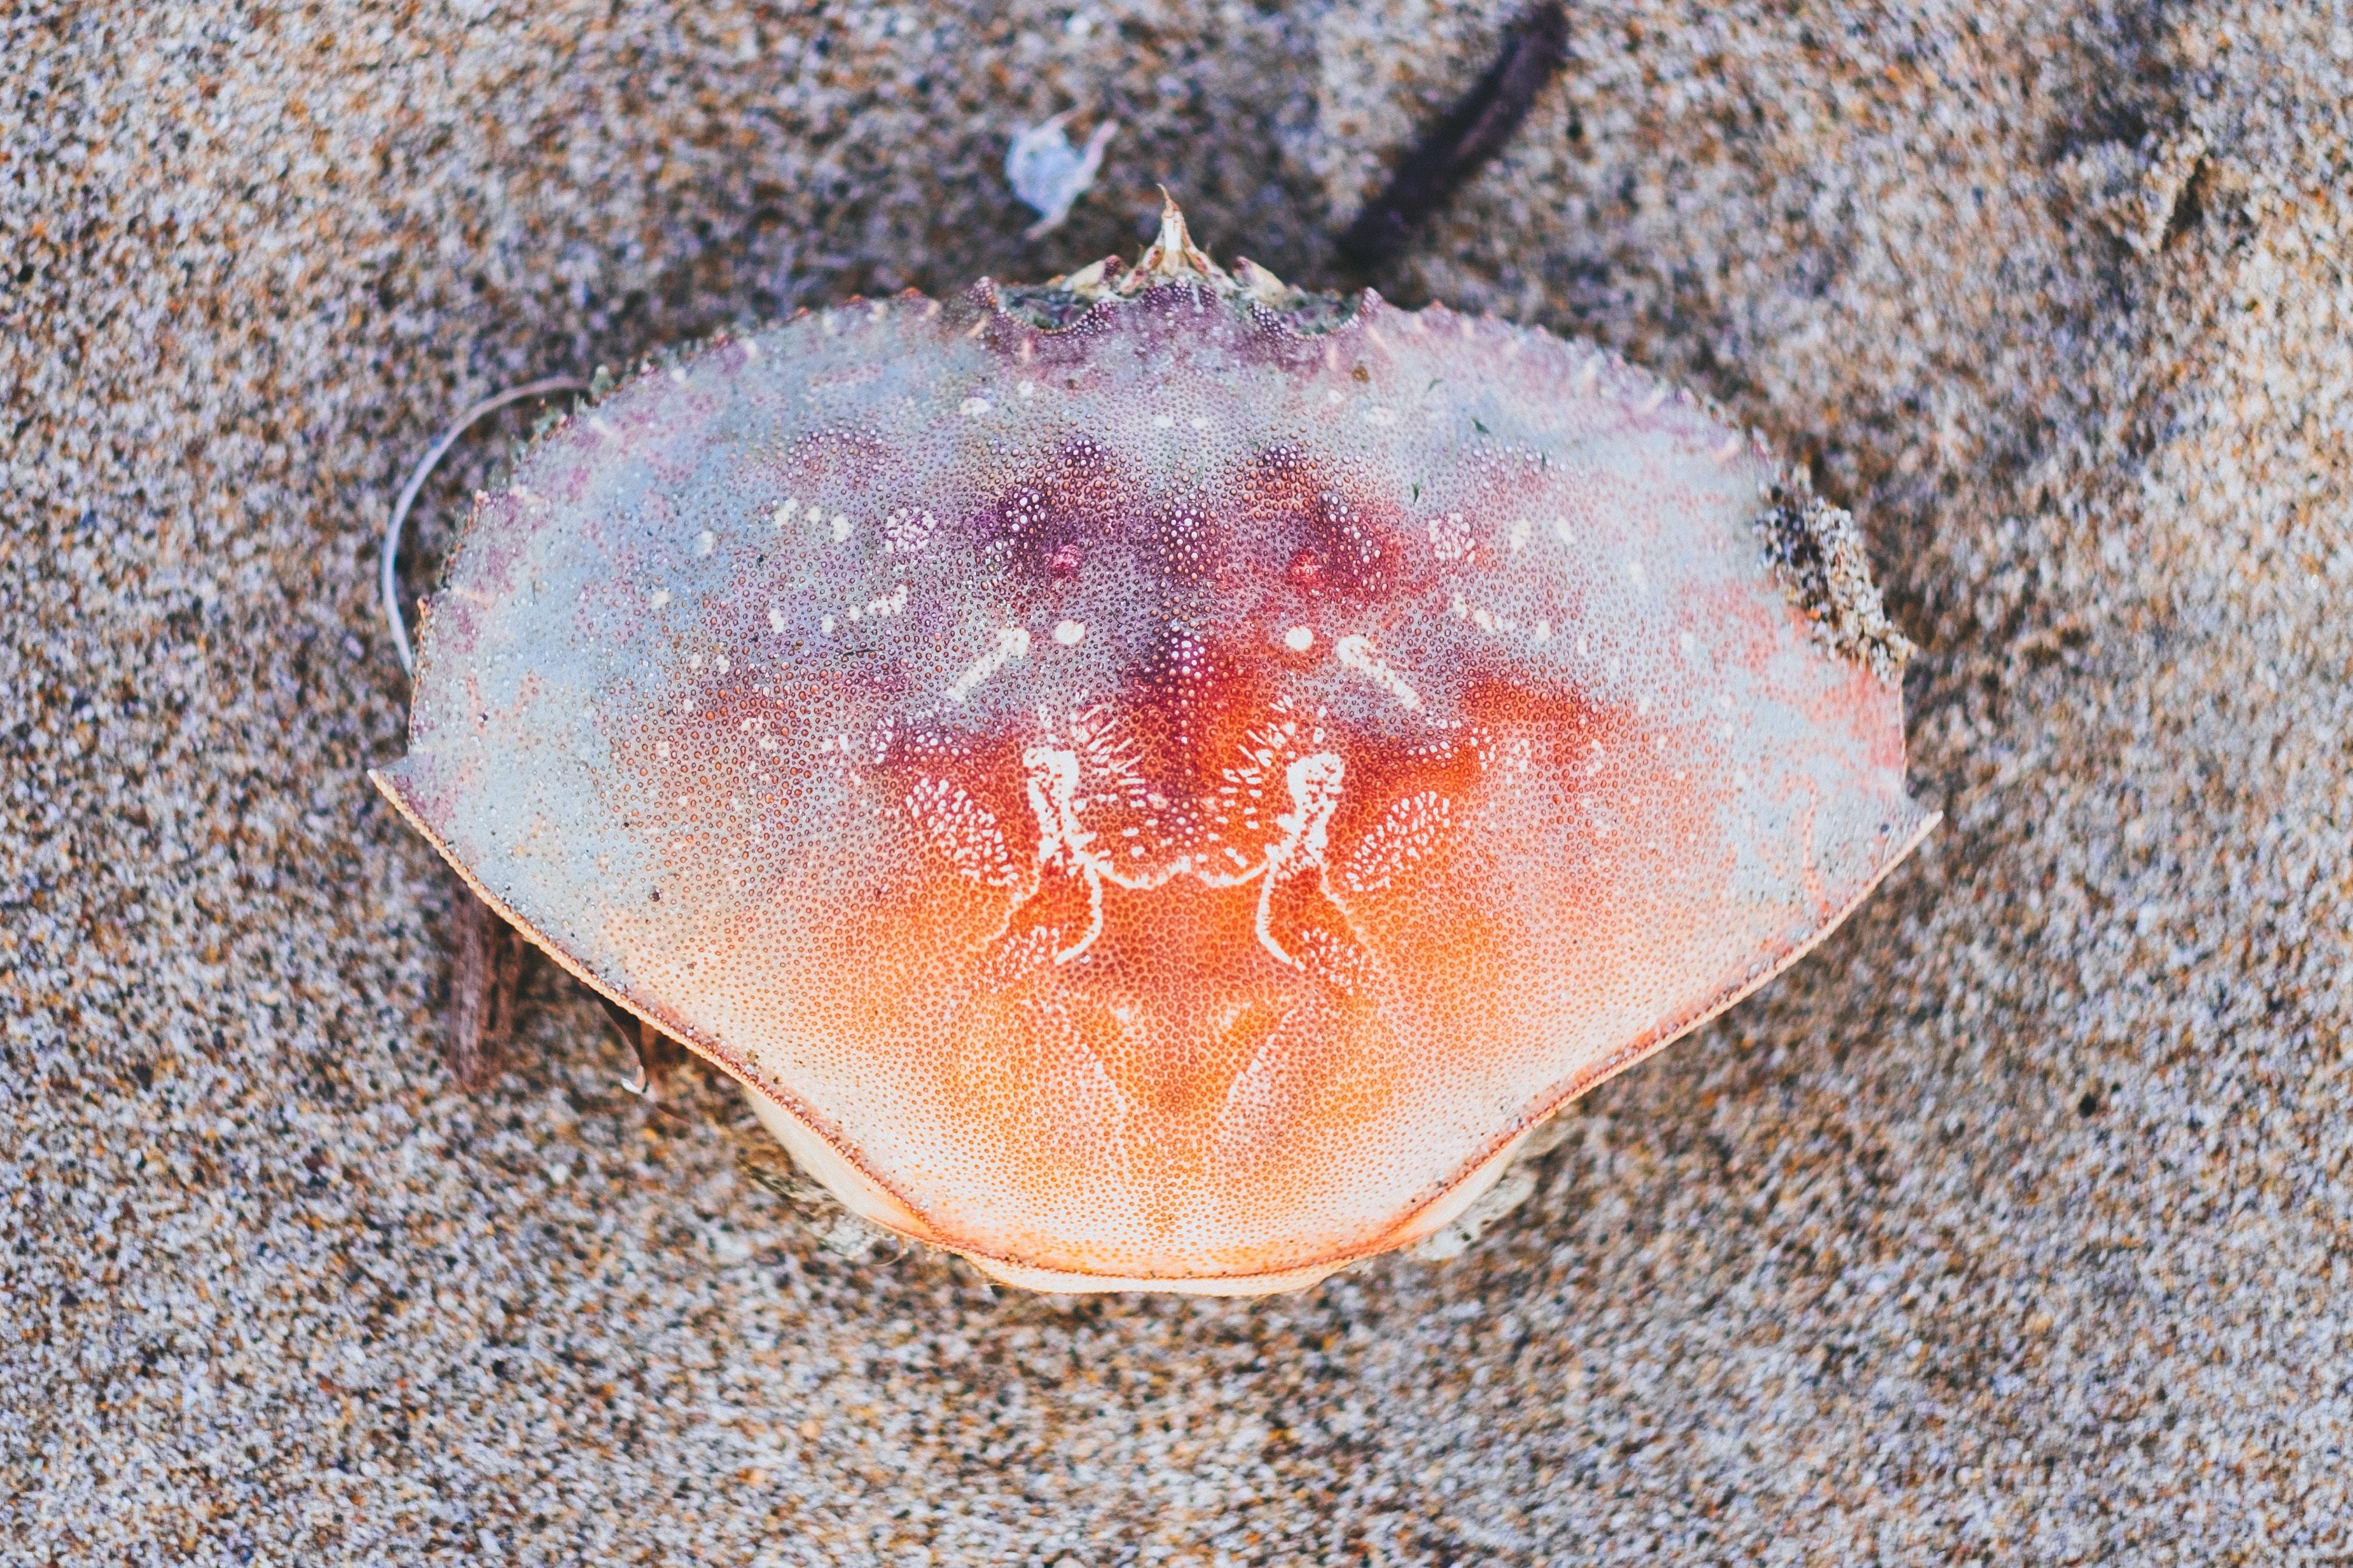 orange crab on brown sand